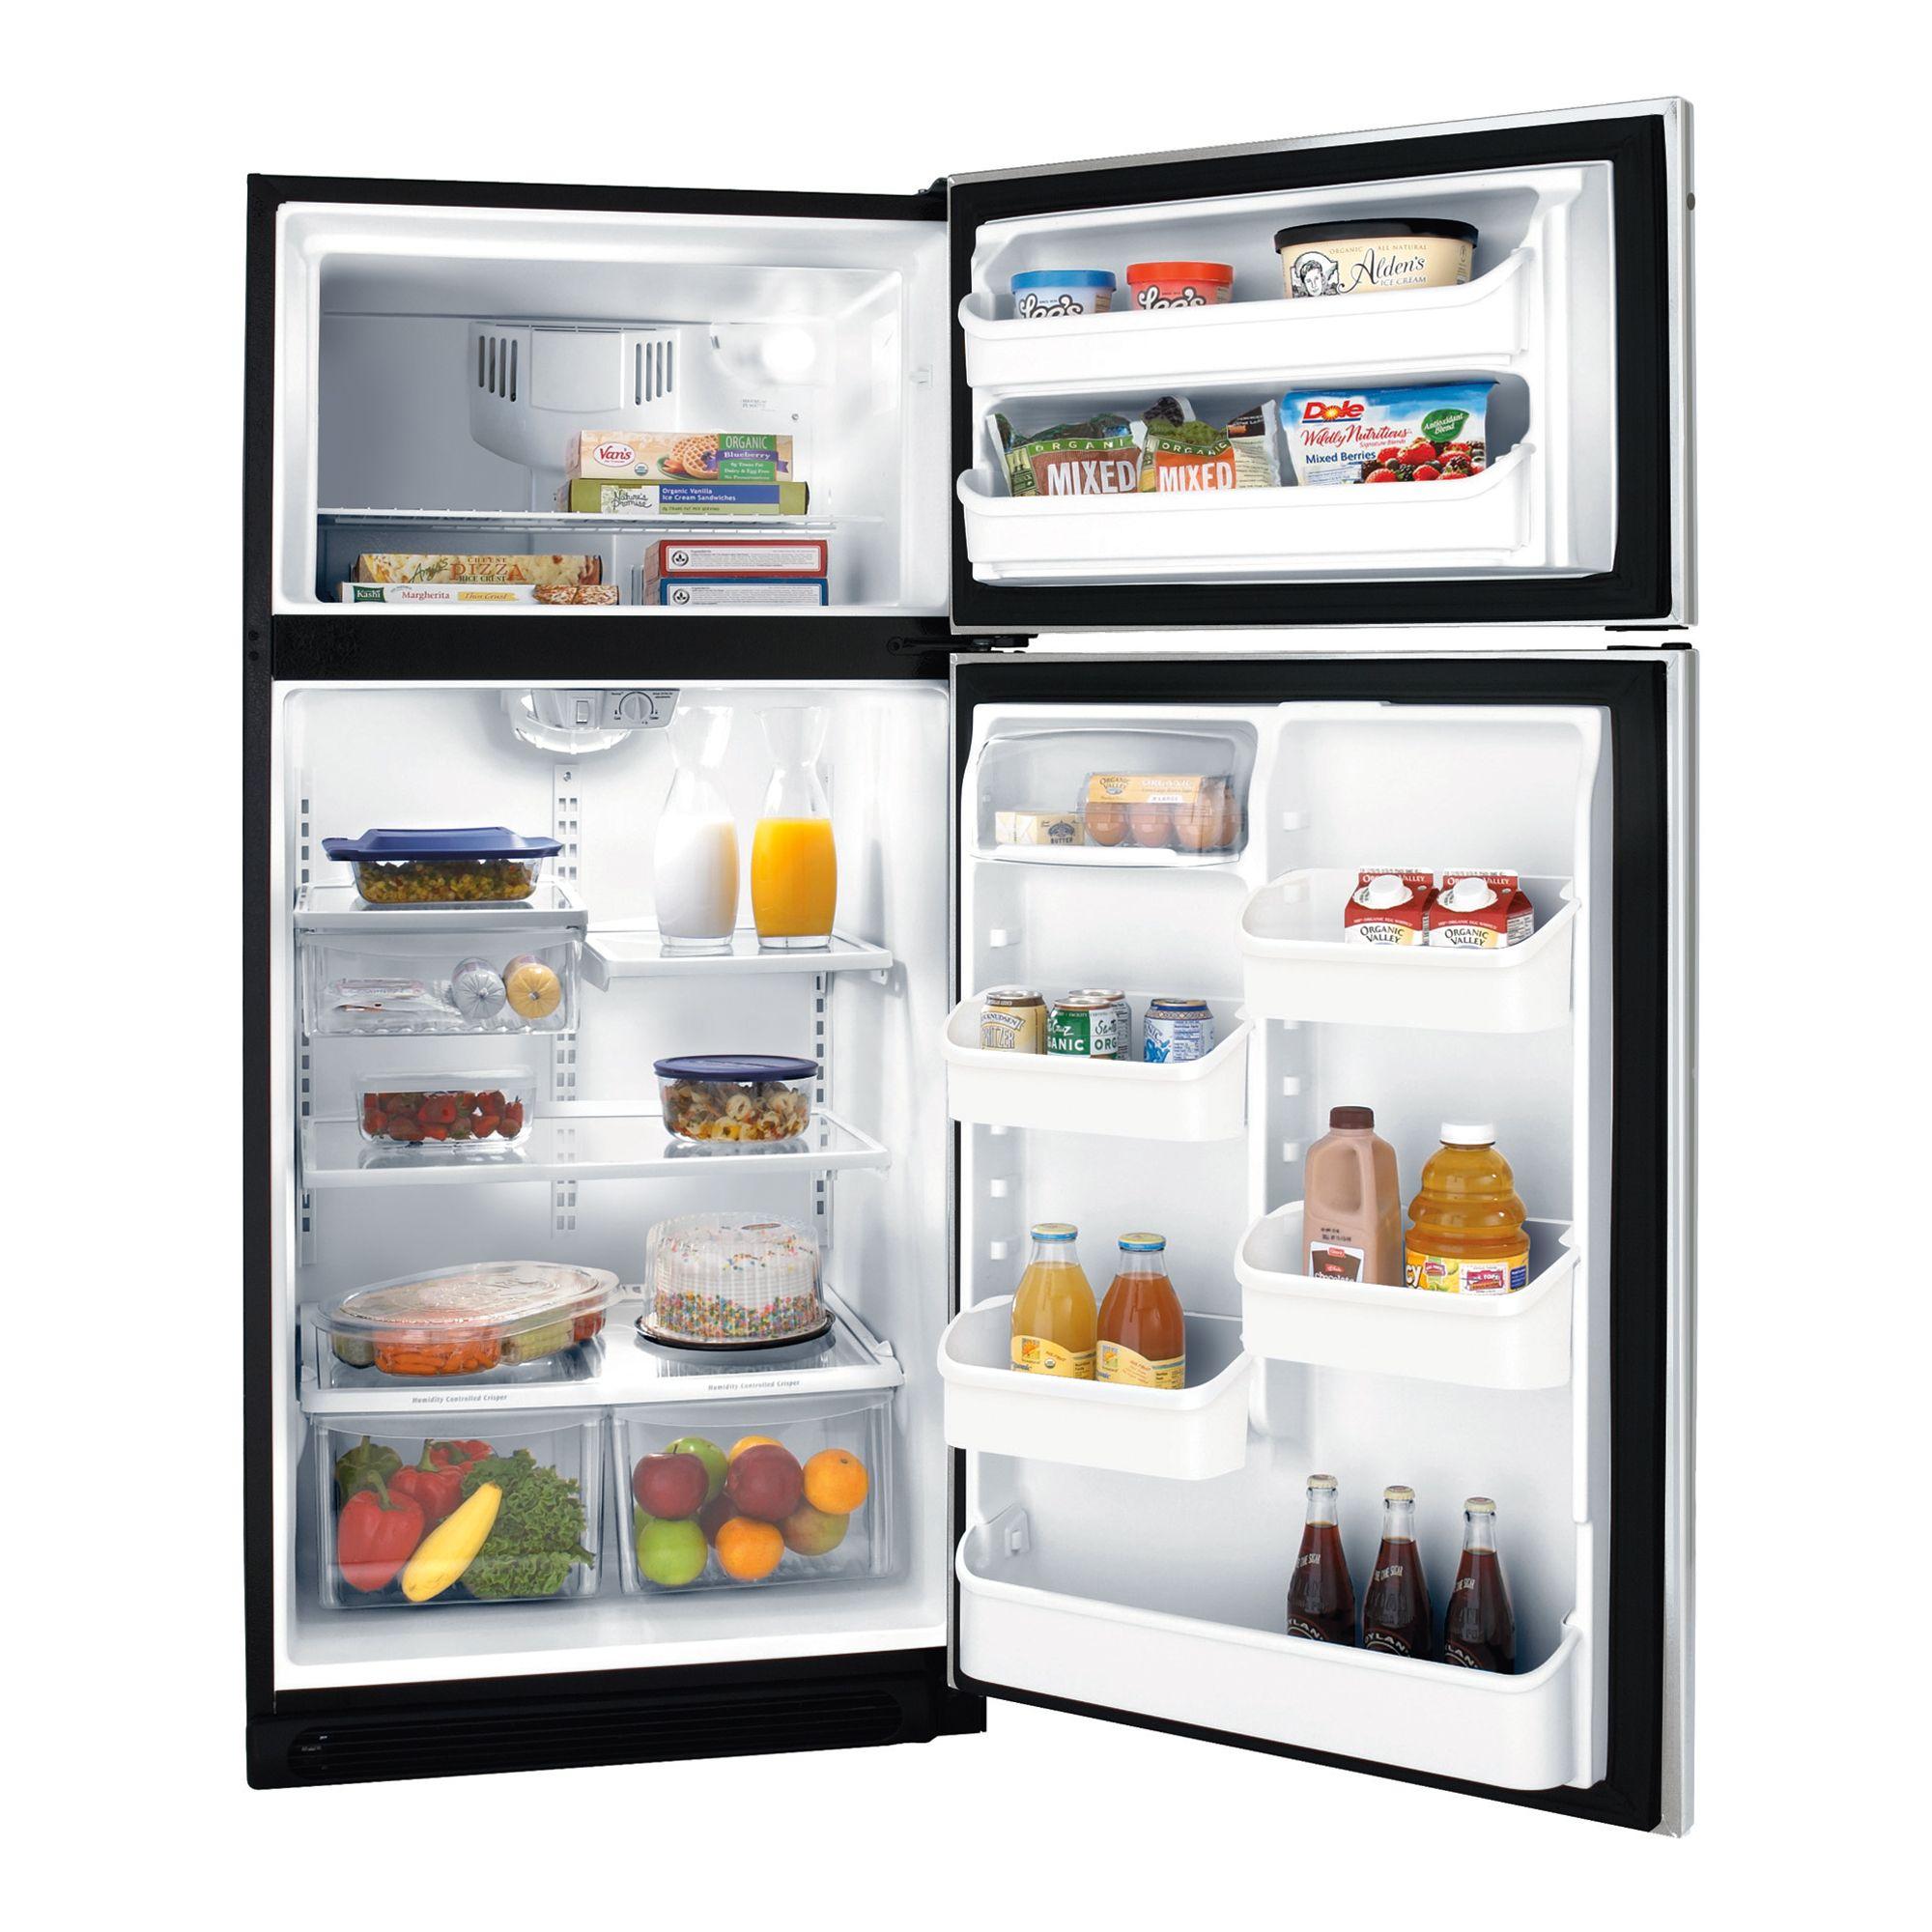 Frigidaire 20.6 cu. ft. Top Freezer Refrigerator (FGHT2144K)